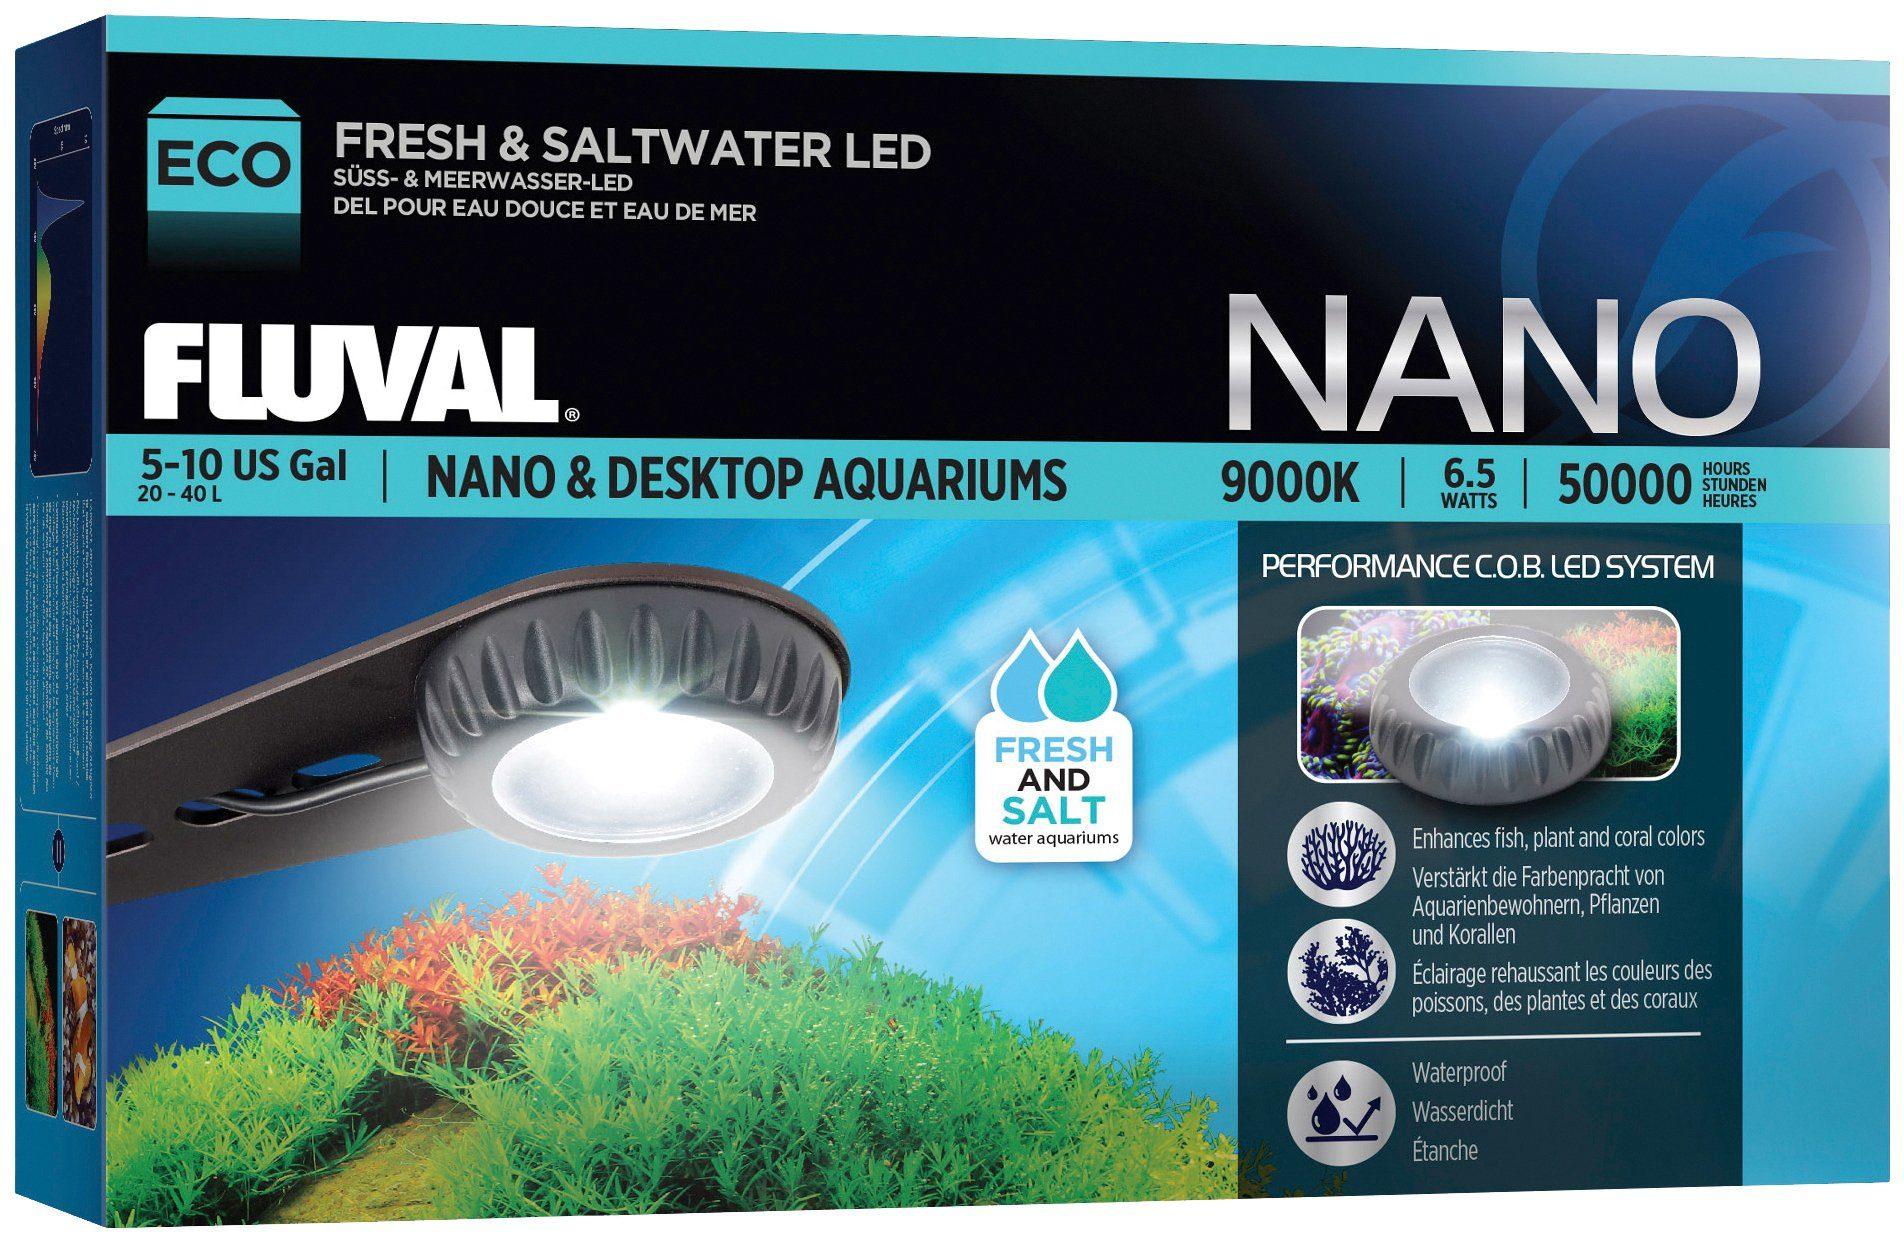 Fluval Aquarium LED-Beleuchtung »Nano LED«